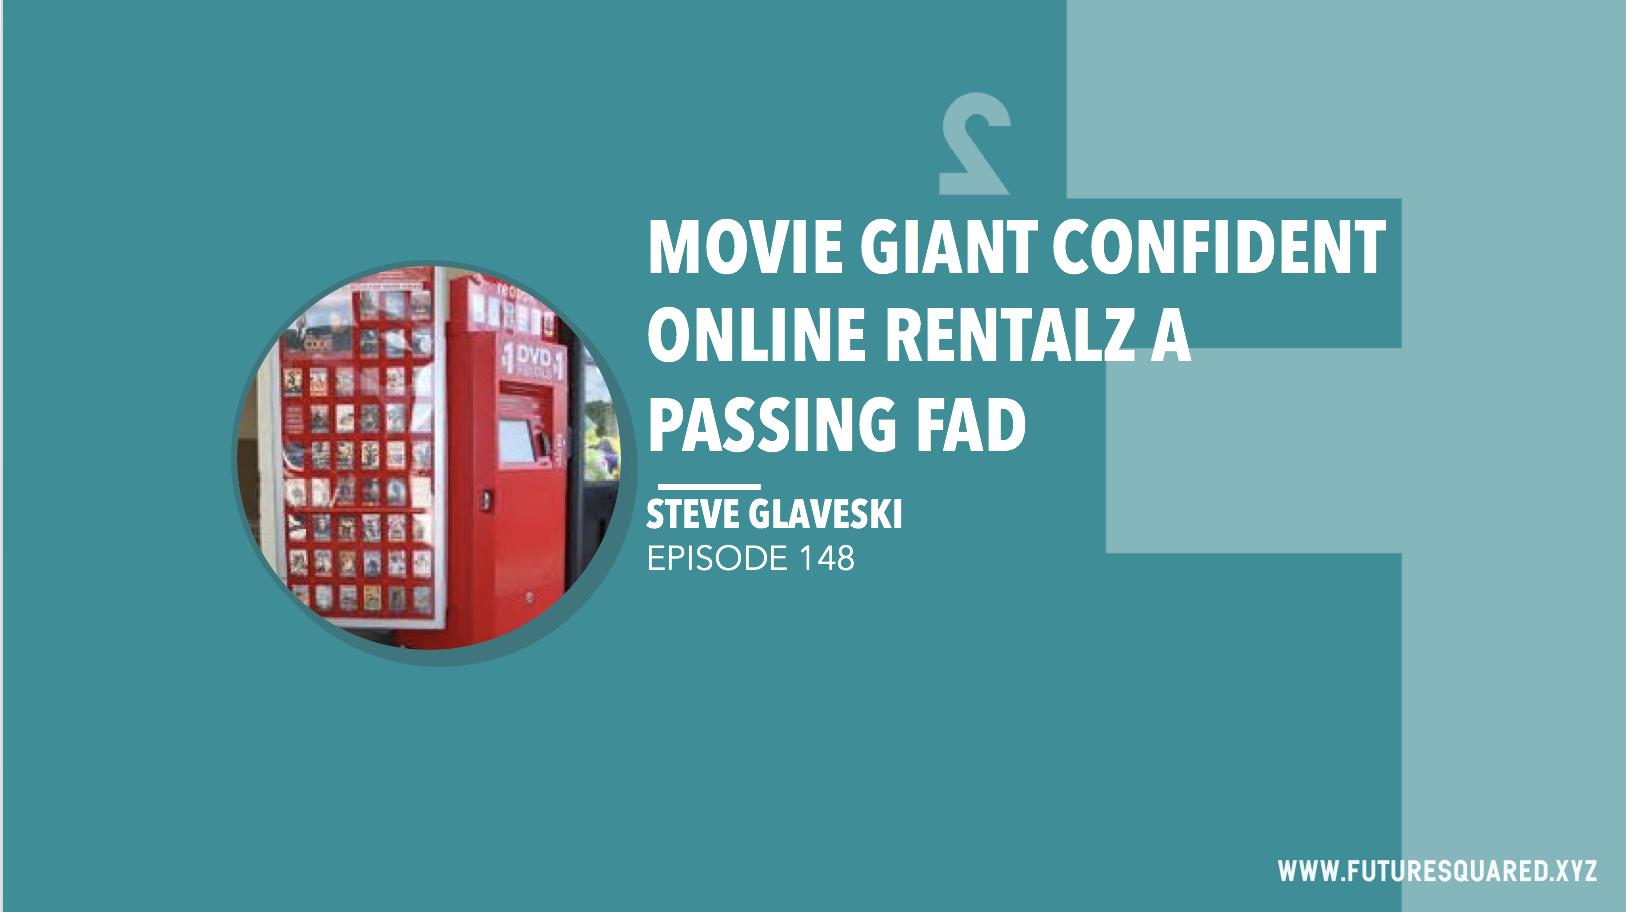 Future Squared Episode #148: Movie Giant Confident Online Rentalz a Passing Fad